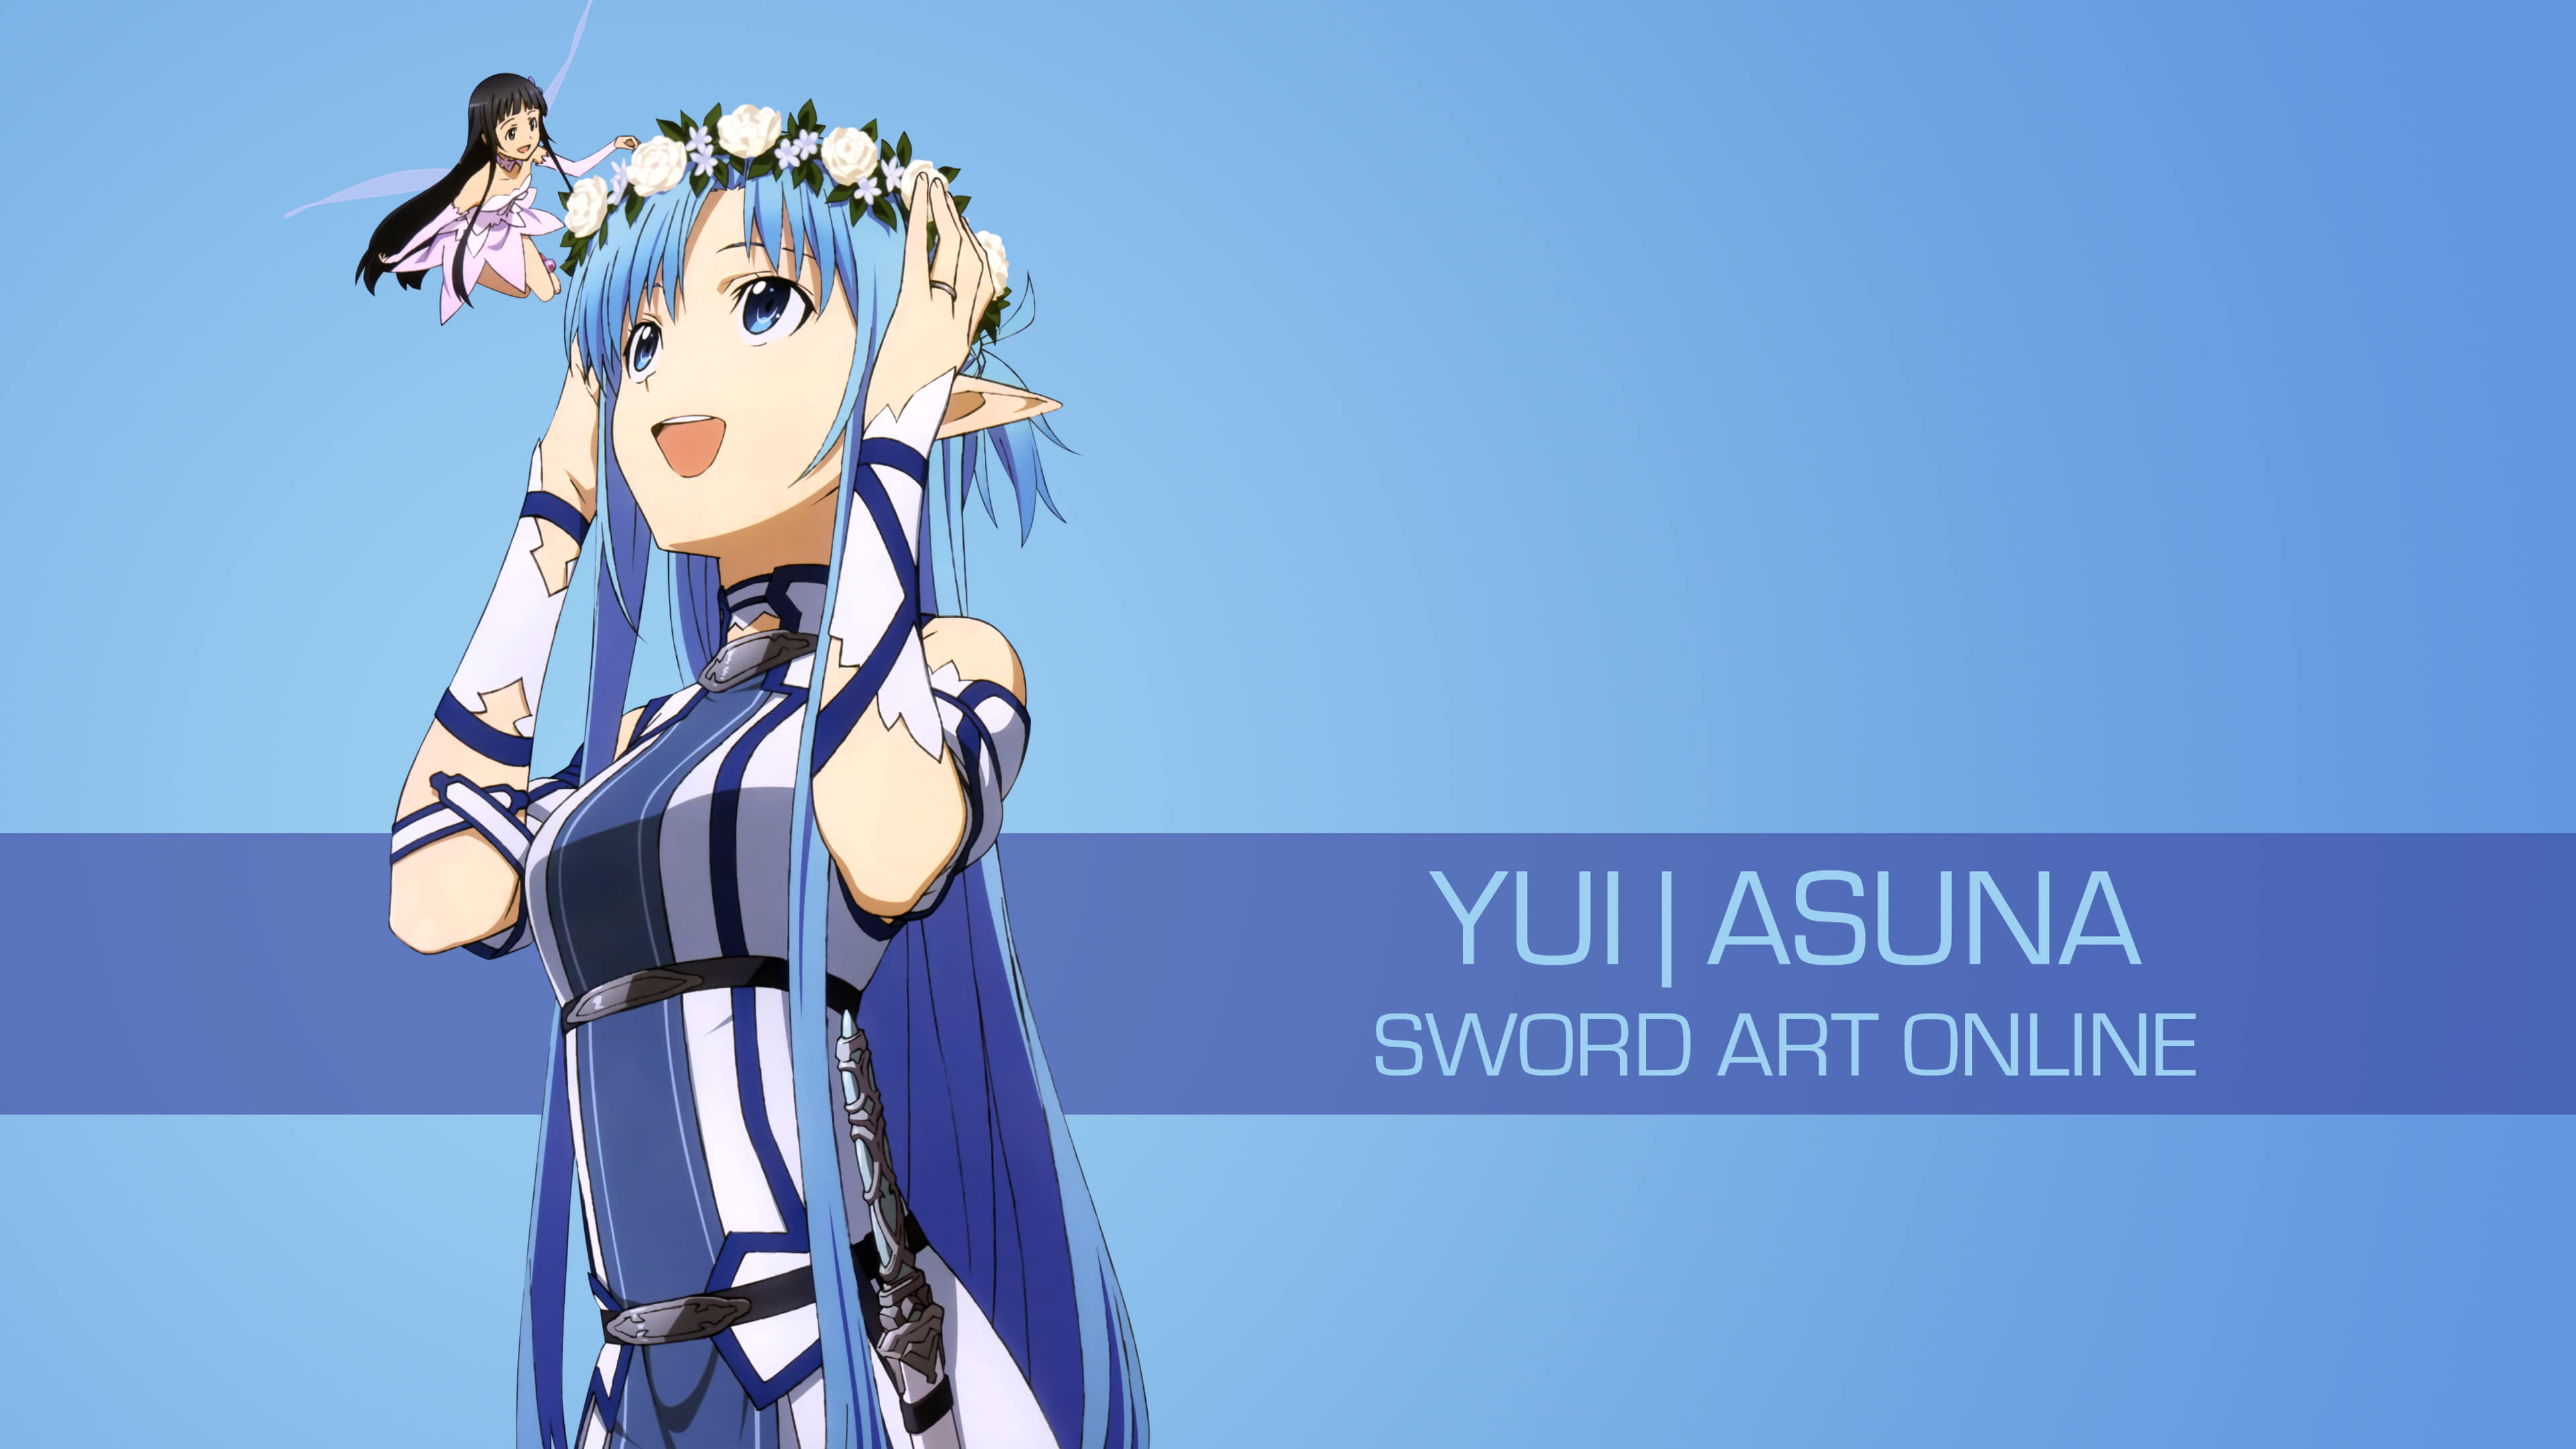 yui asuna sword art online uhd 4k wallpaper